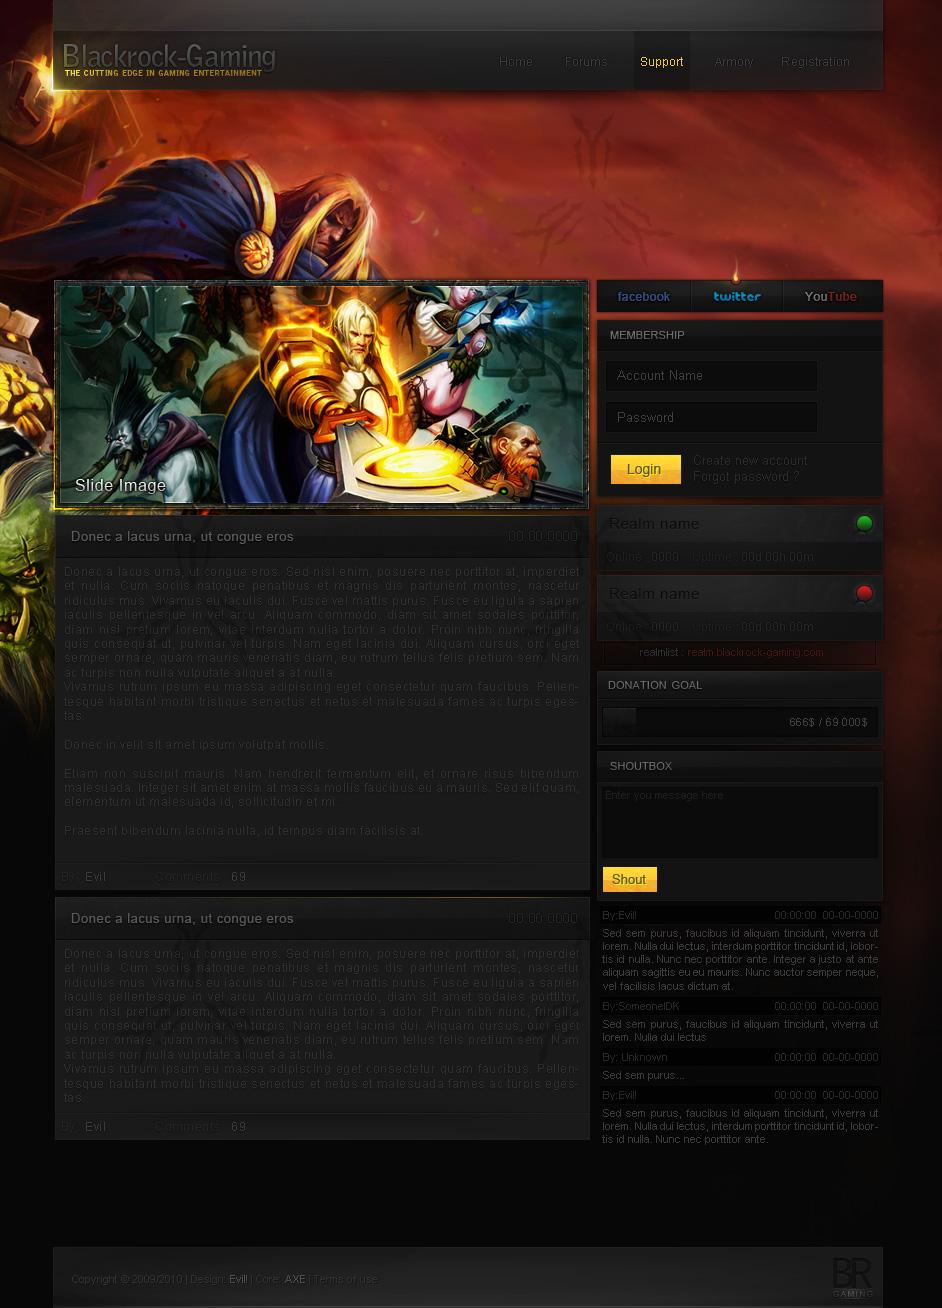 Blackrock Gaming by Evil-S